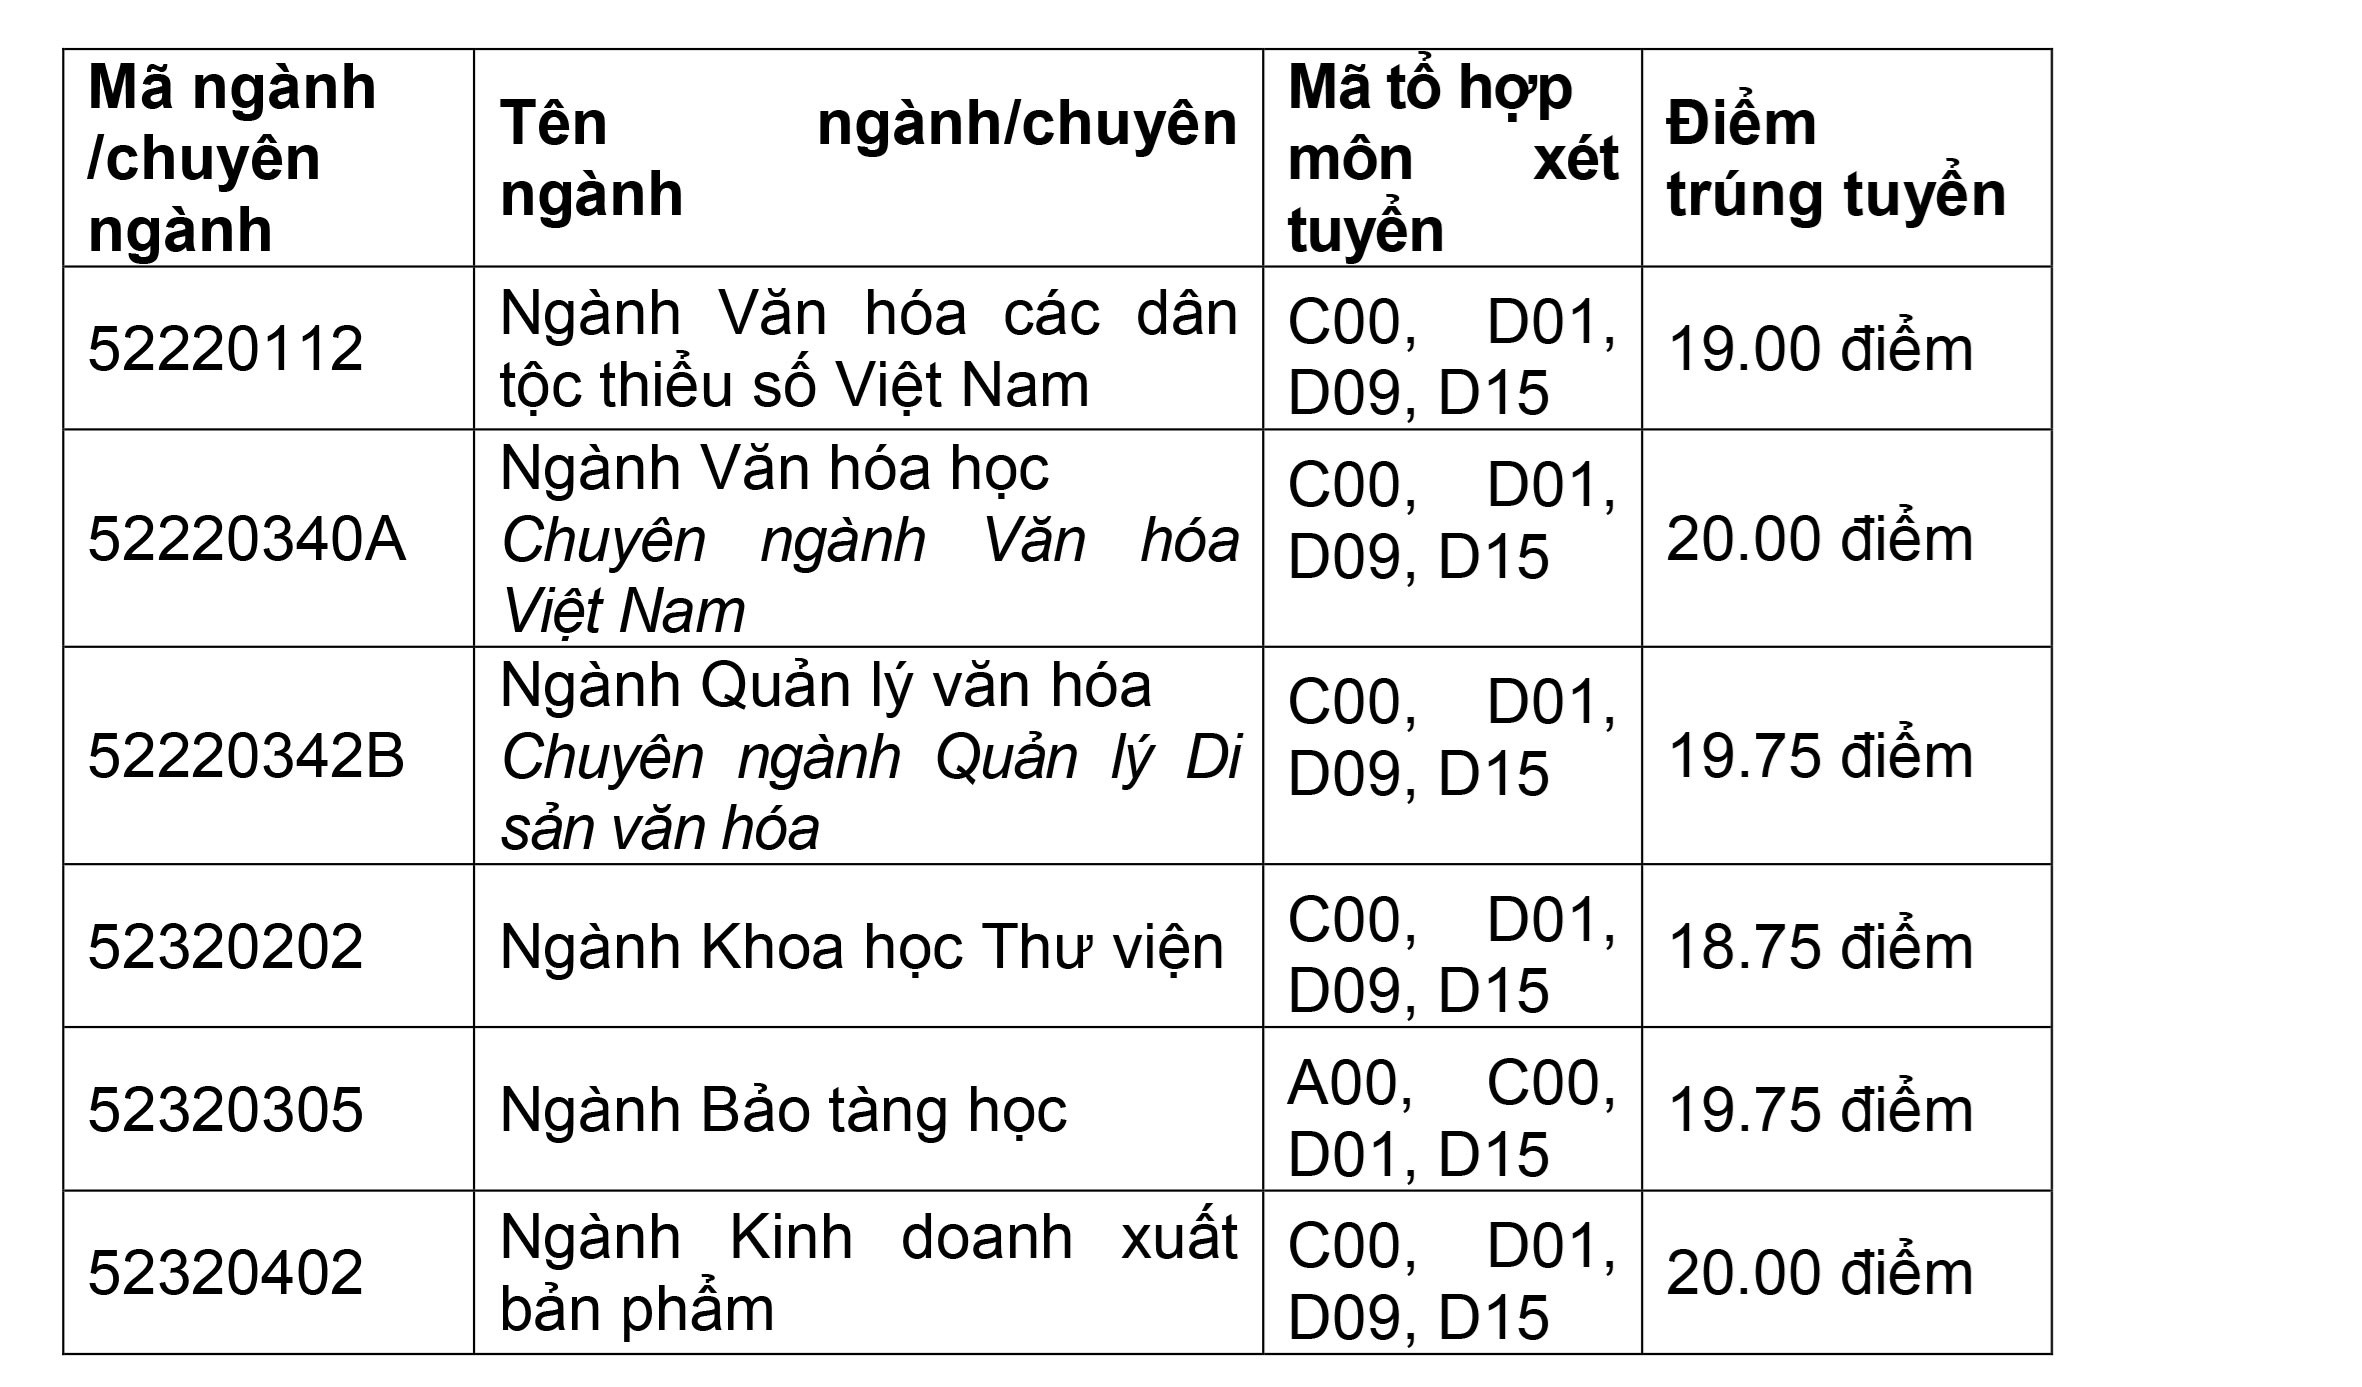 danh-sach-diem-chuan-xet-tuyen-bo-sung-cua-tat-ca-cac-truong-tren-ca-nuoc-2